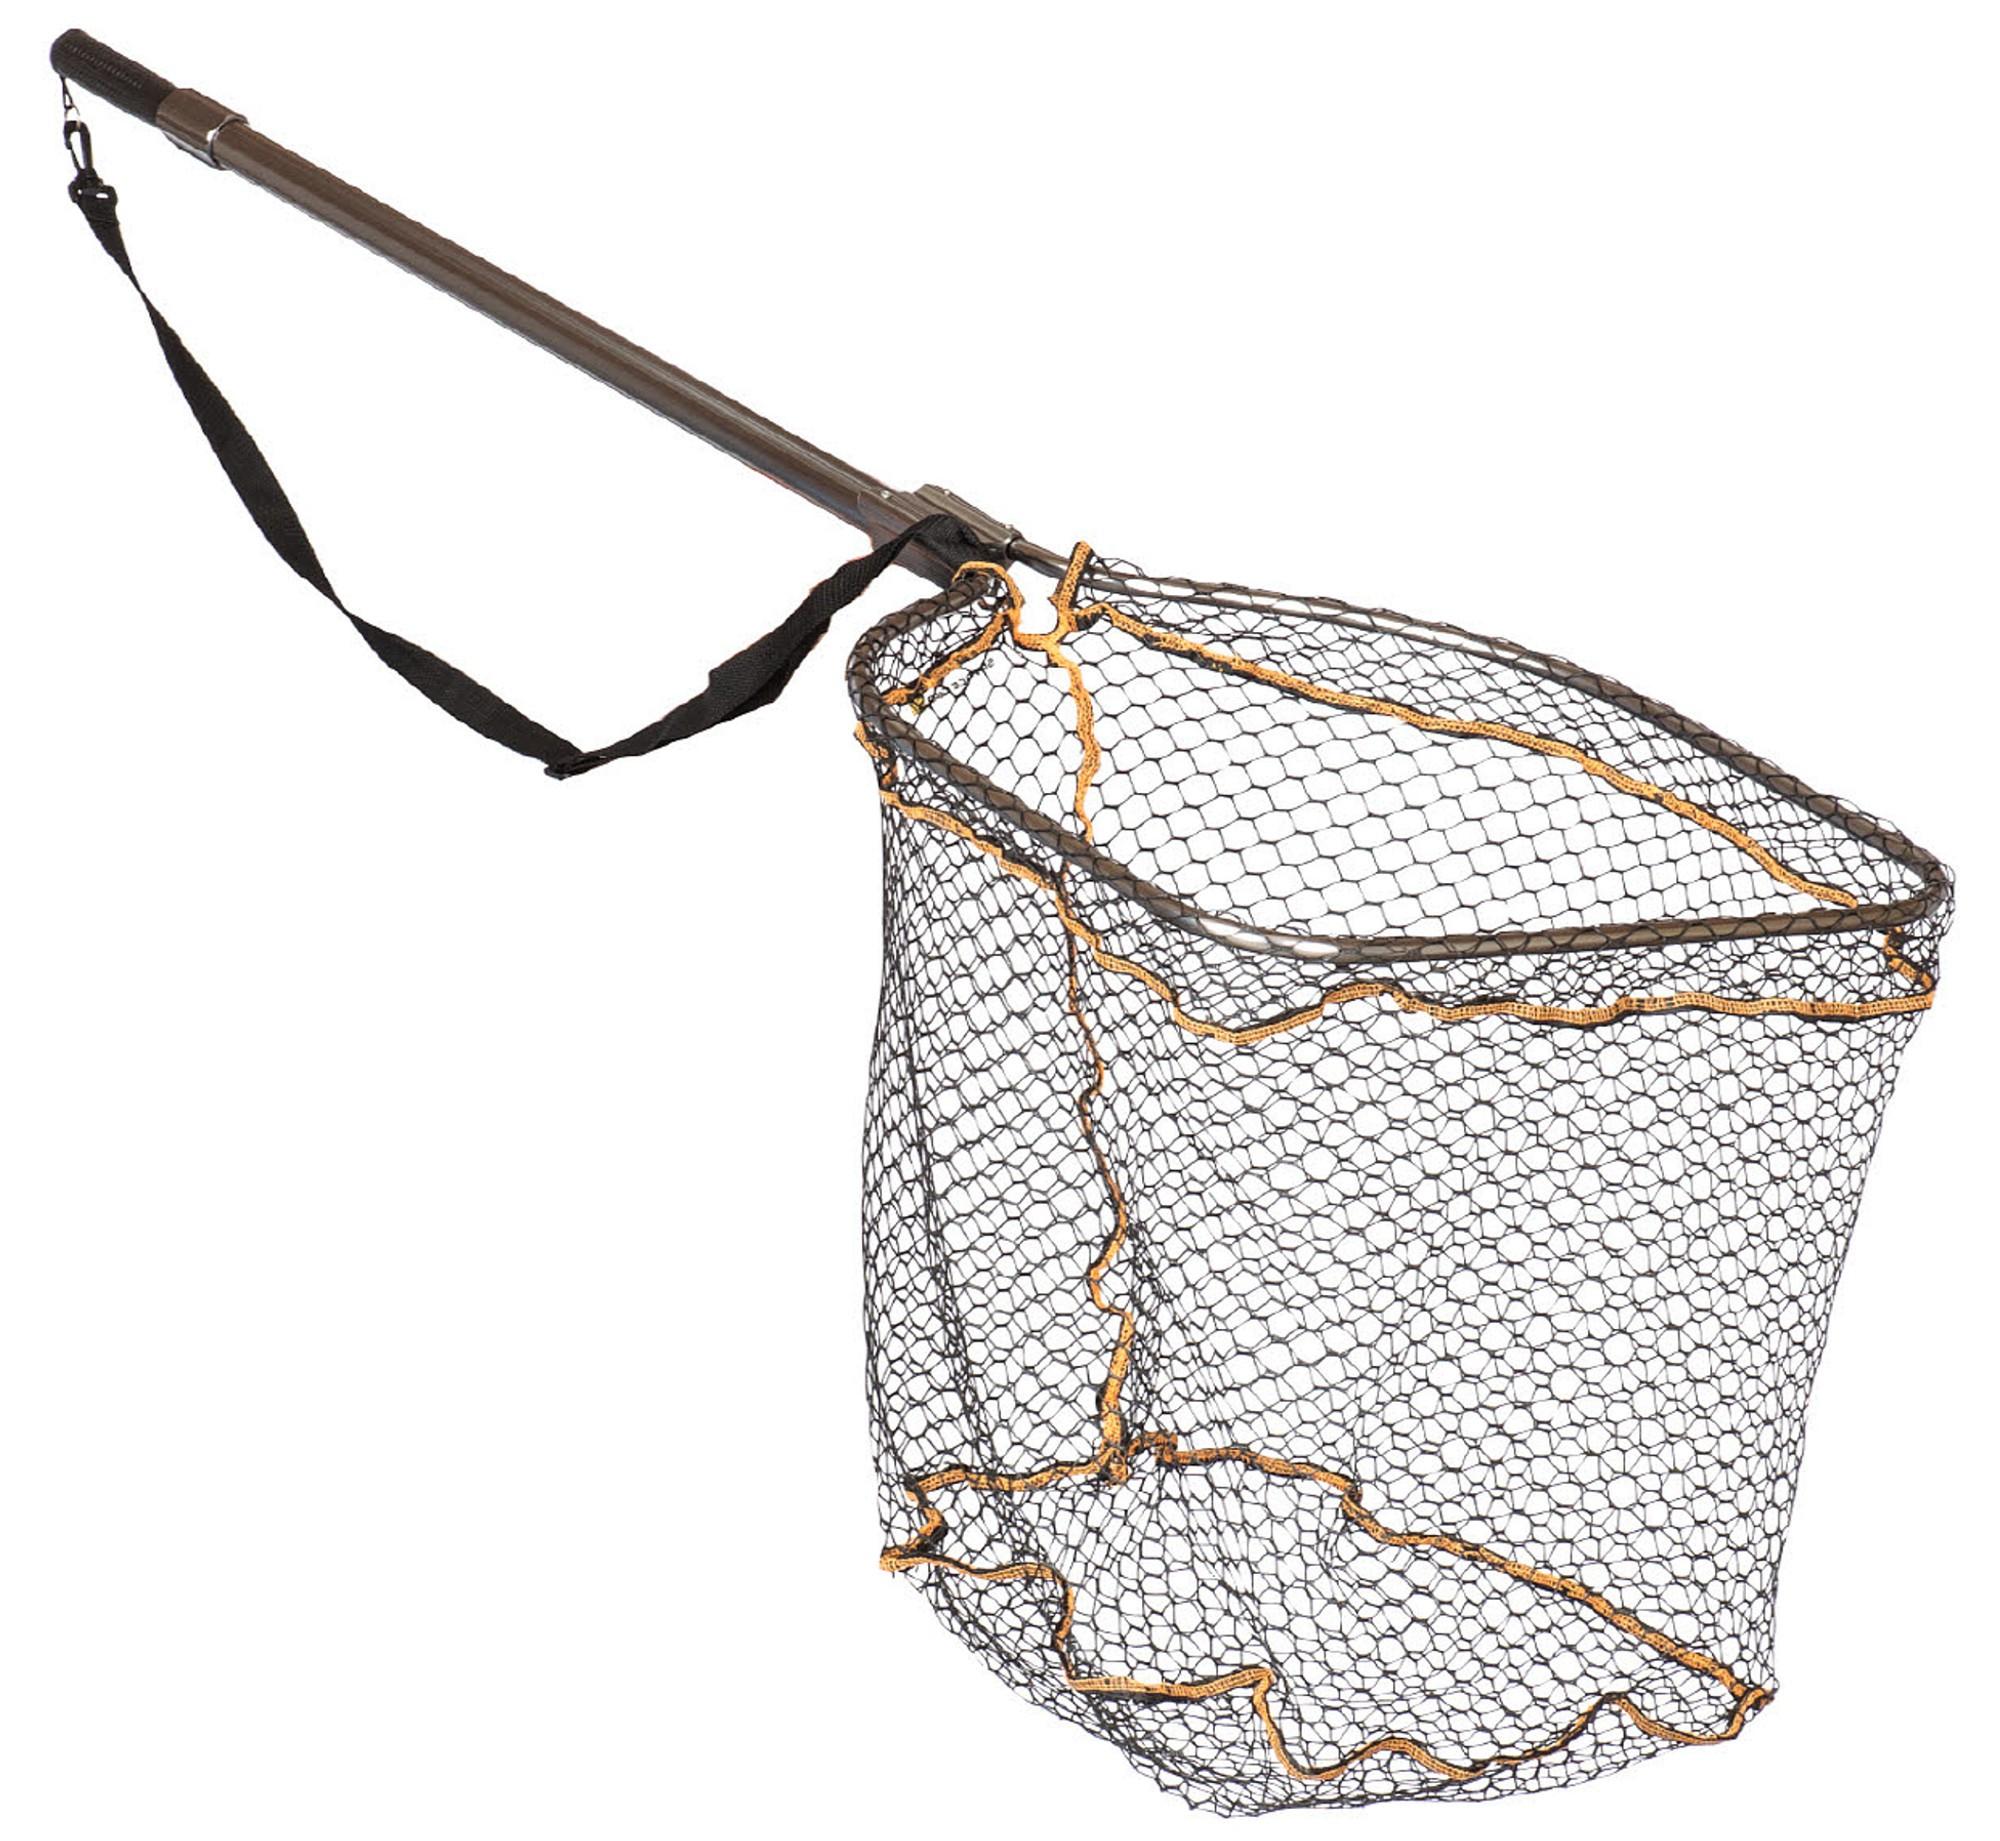 Karpfenkescher Fischerei Kescher Fischernetz Fishing Landing Net 50cm